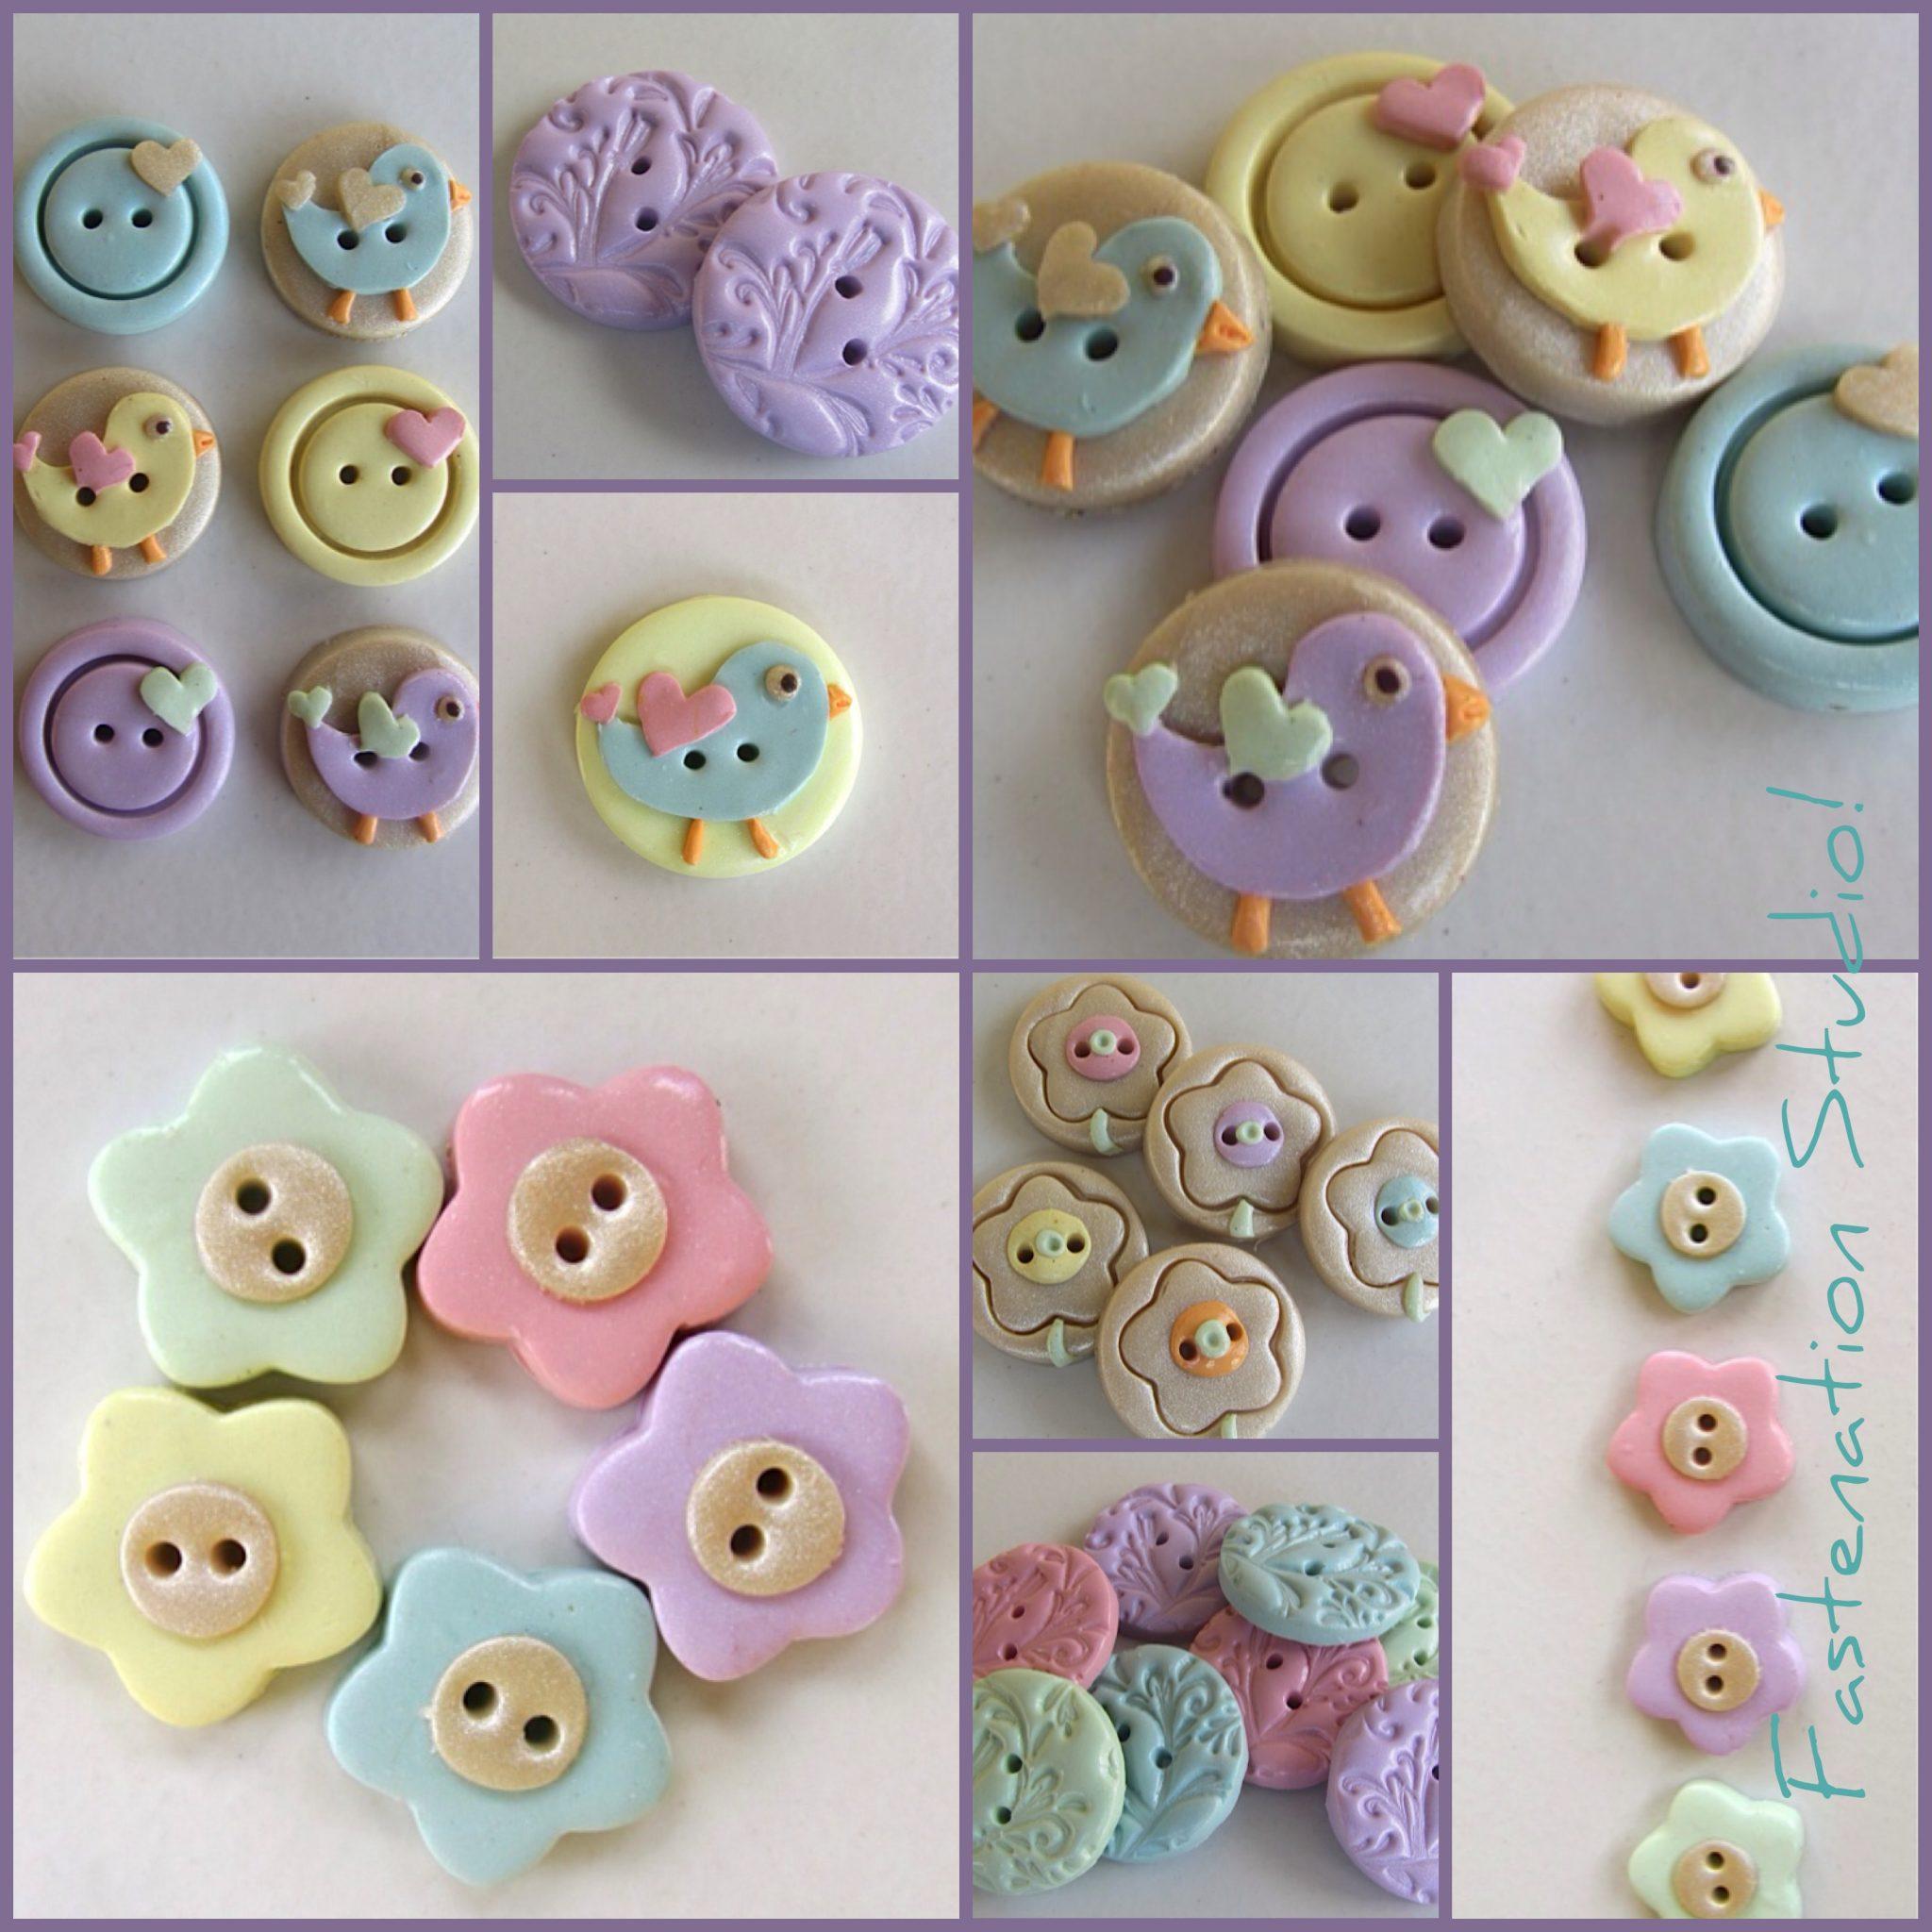 Shop Hand-made Buttons